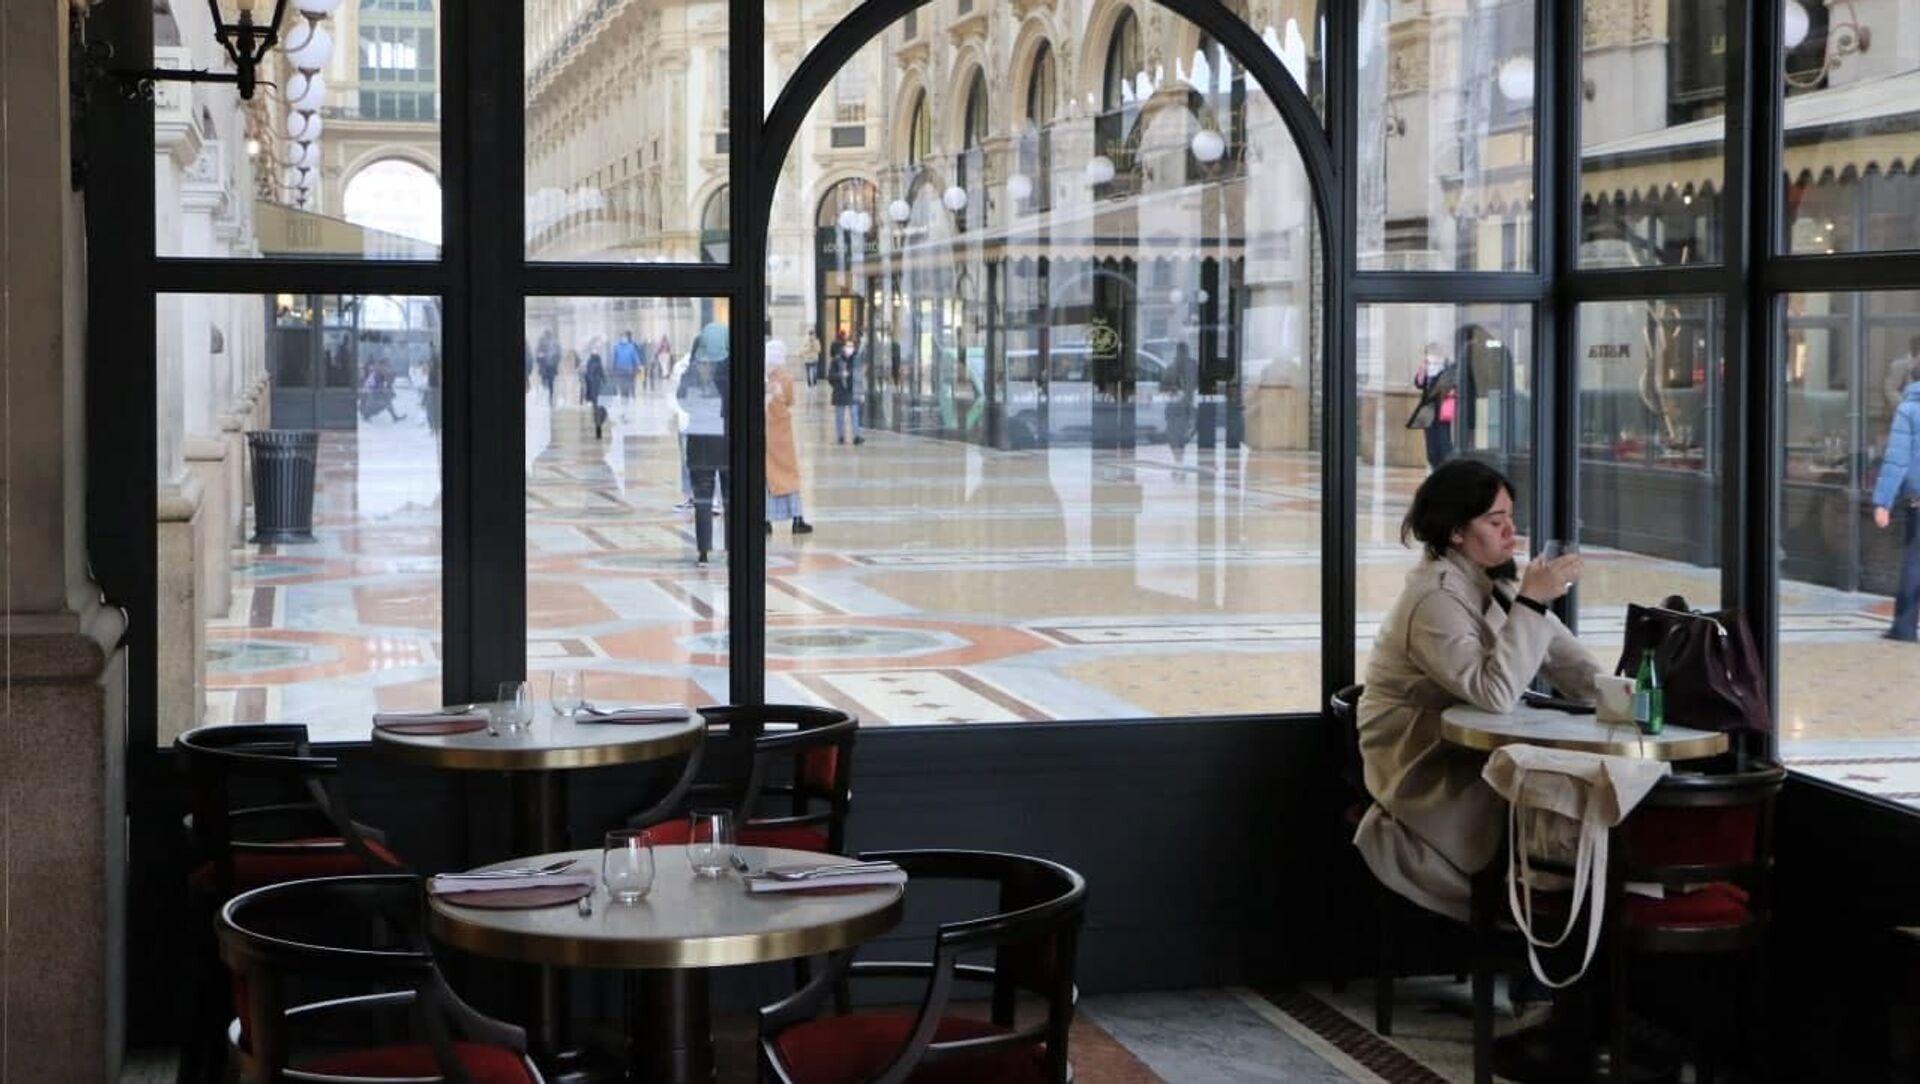 Un bar a Milano, Italia - Sputnik Italia, 1920, 25.04.2021